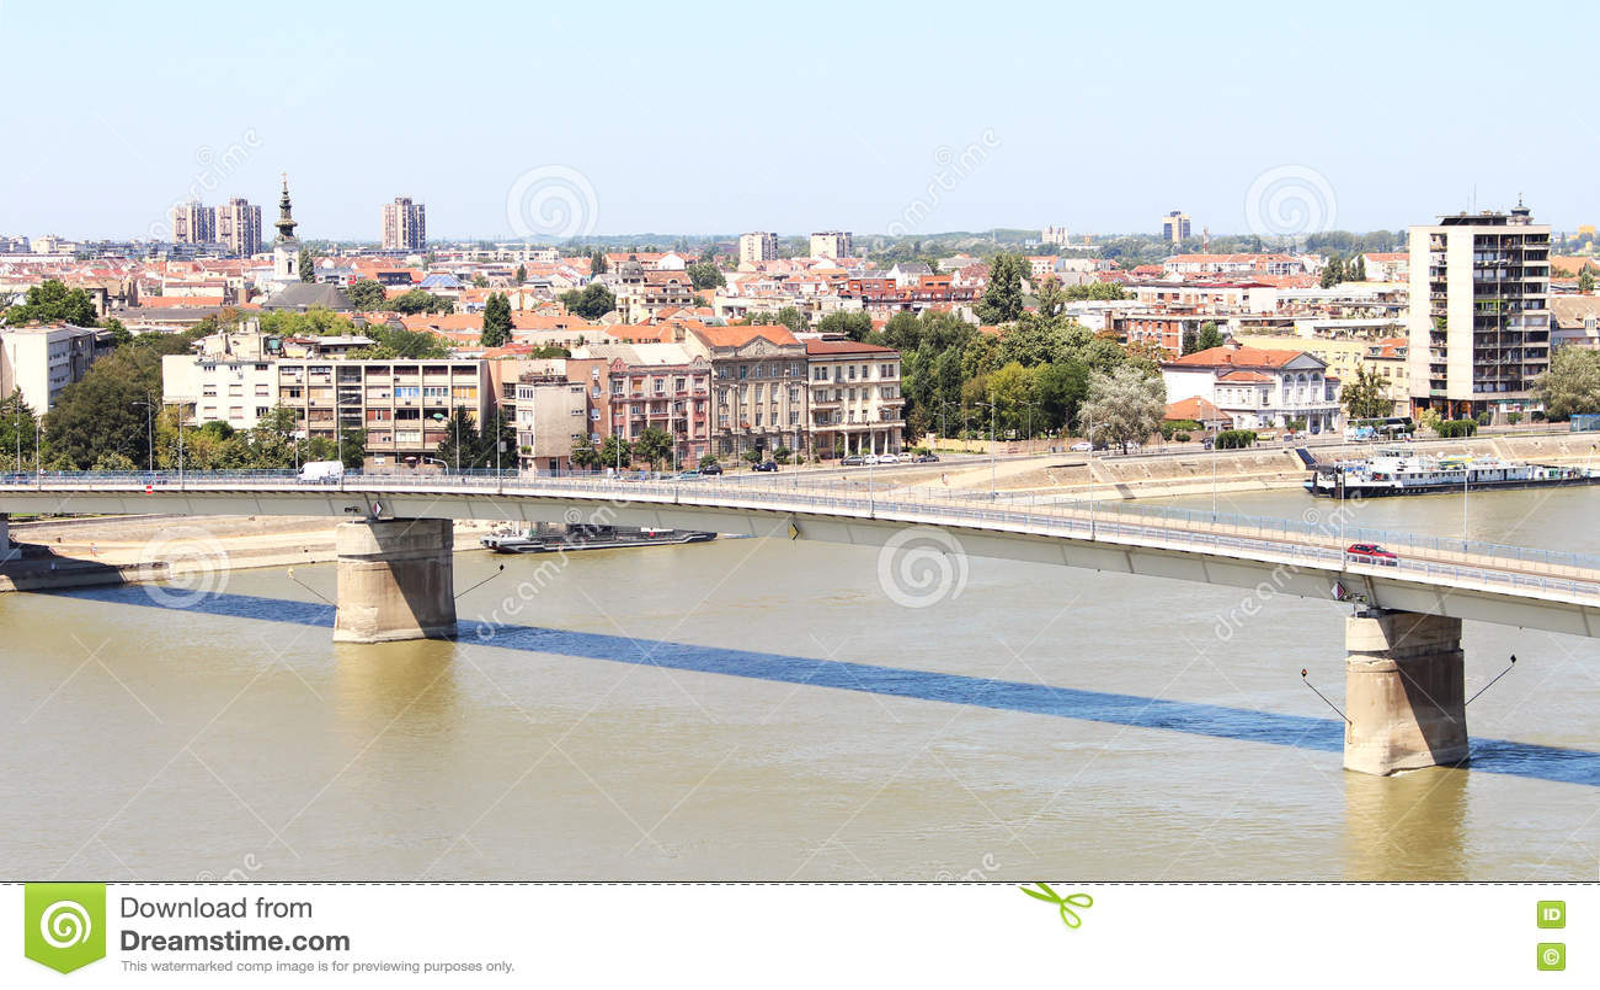 View of the Serbian city of Novi Sad and the bridge over the Dan